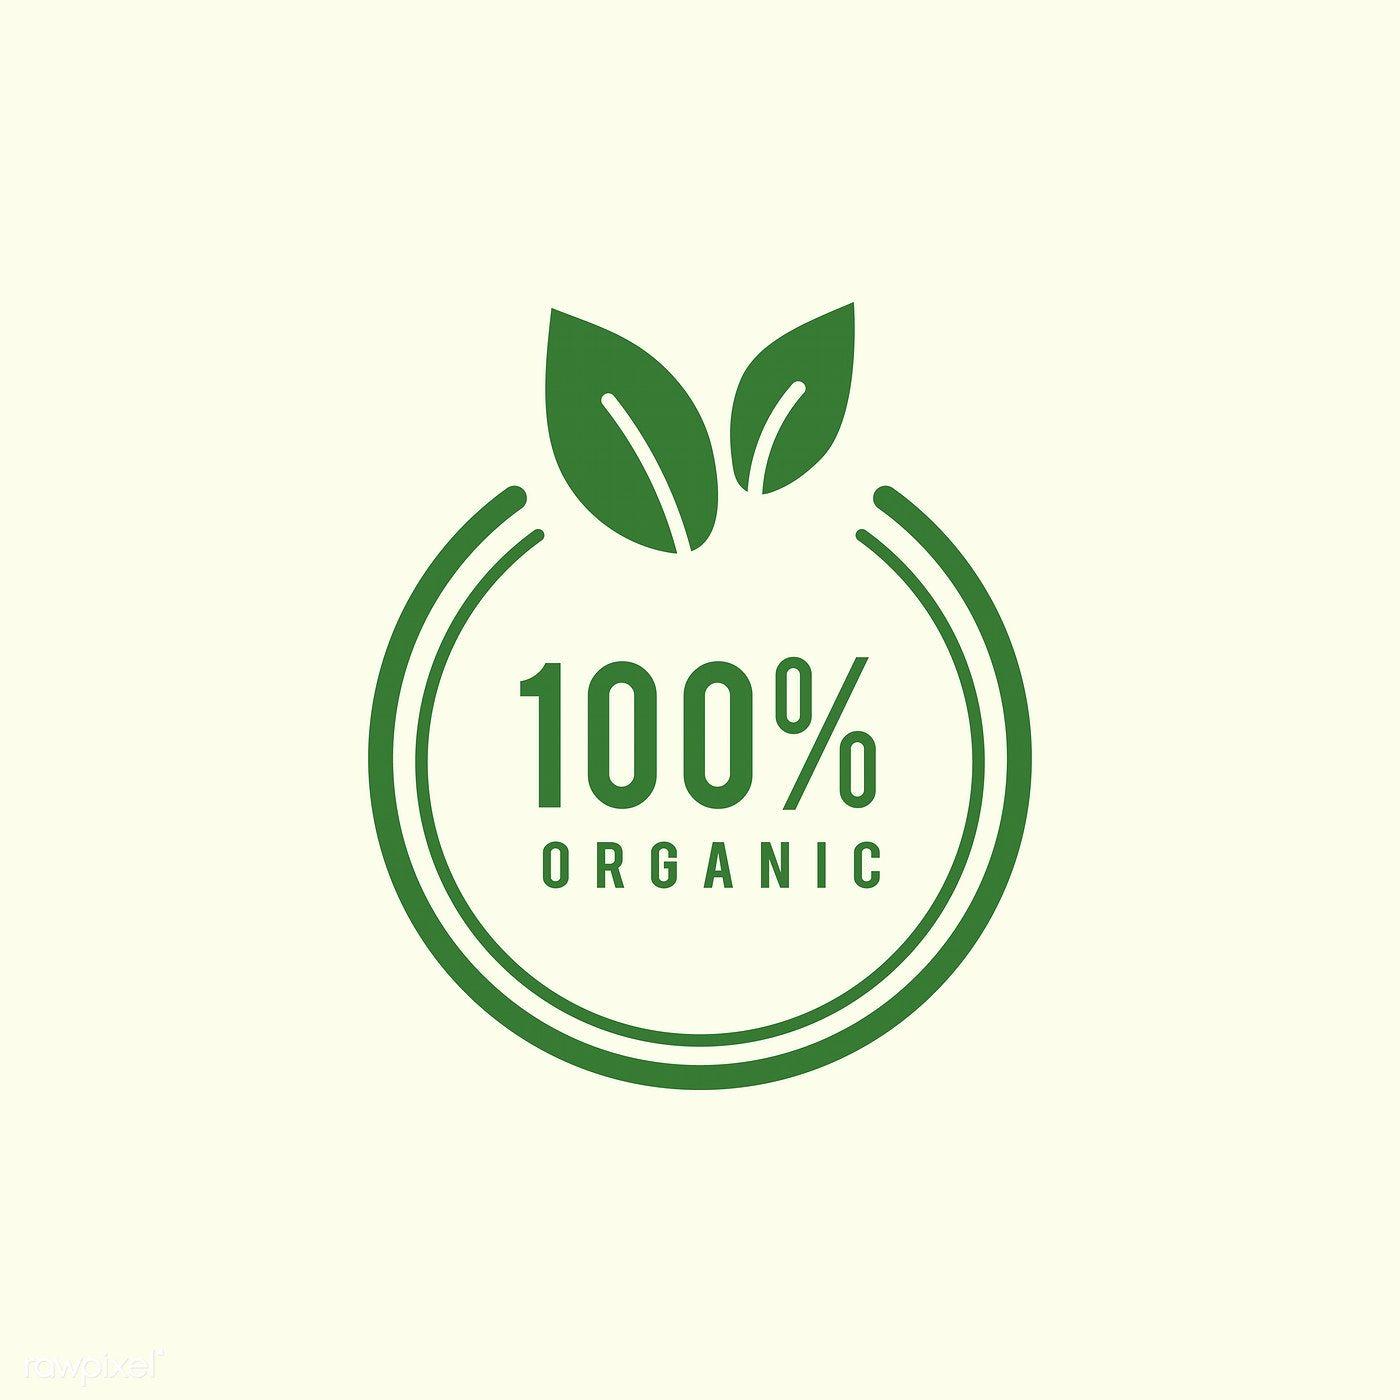 100 percent organic emblem illustration free image by rawpixel com